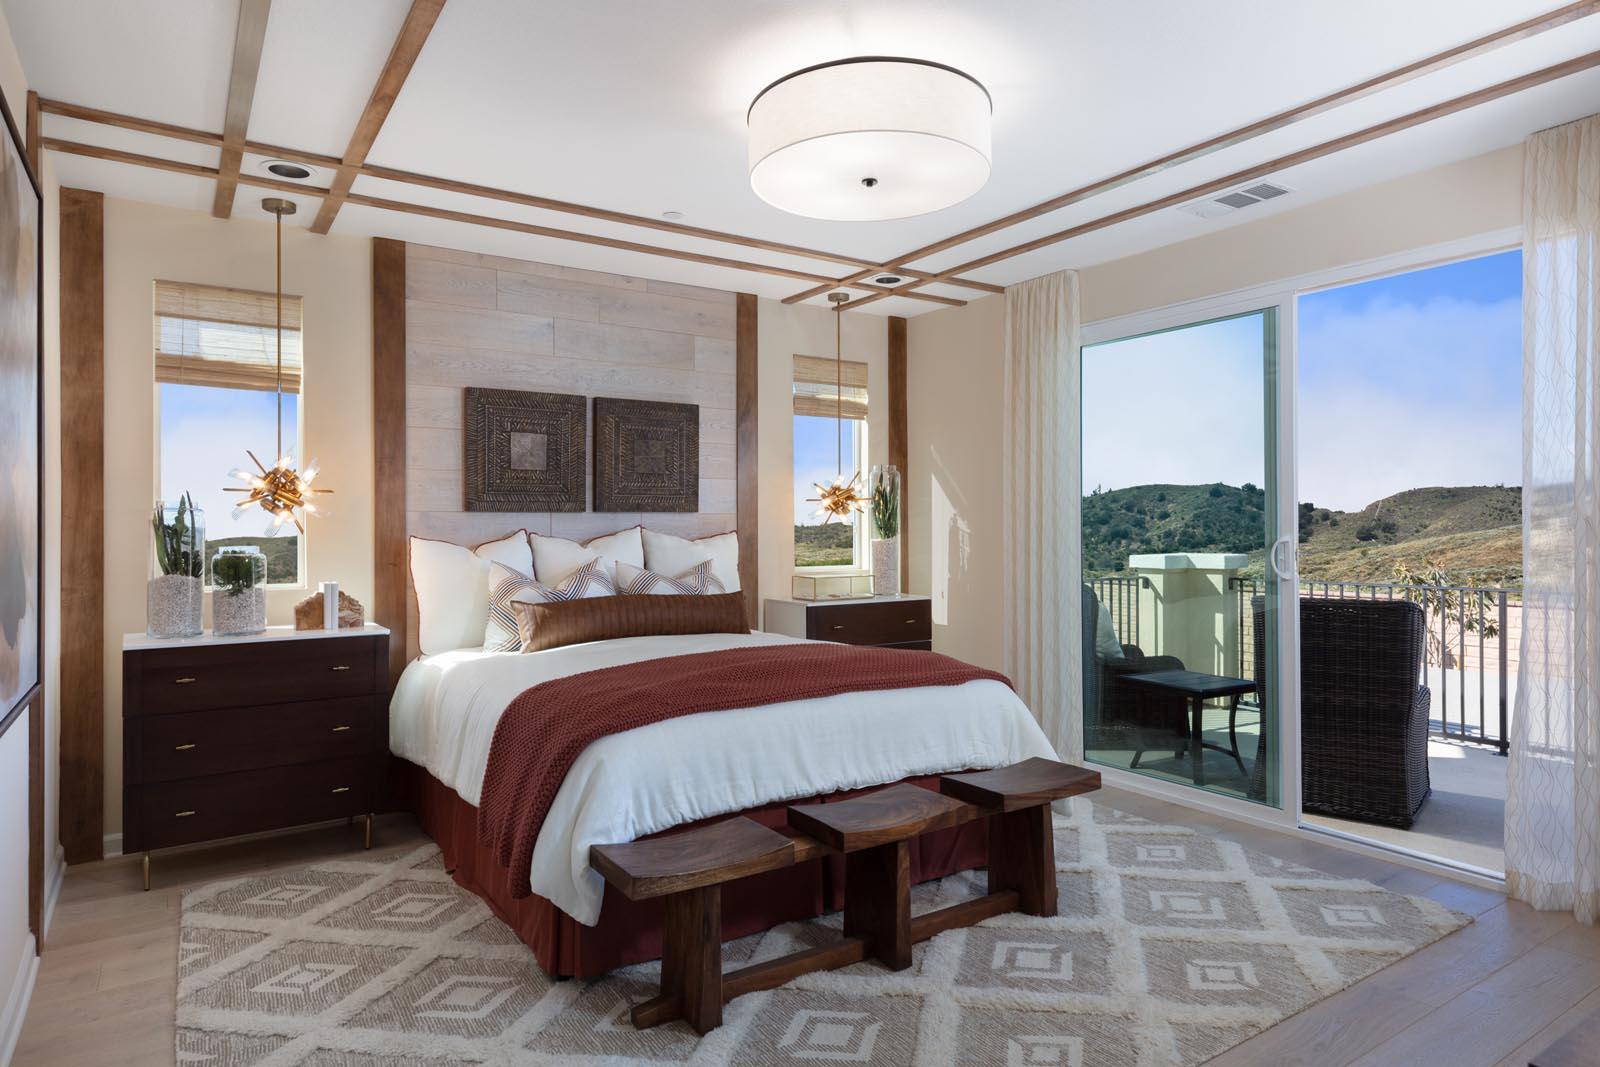 Canopy Plan 3 Master Bedroom